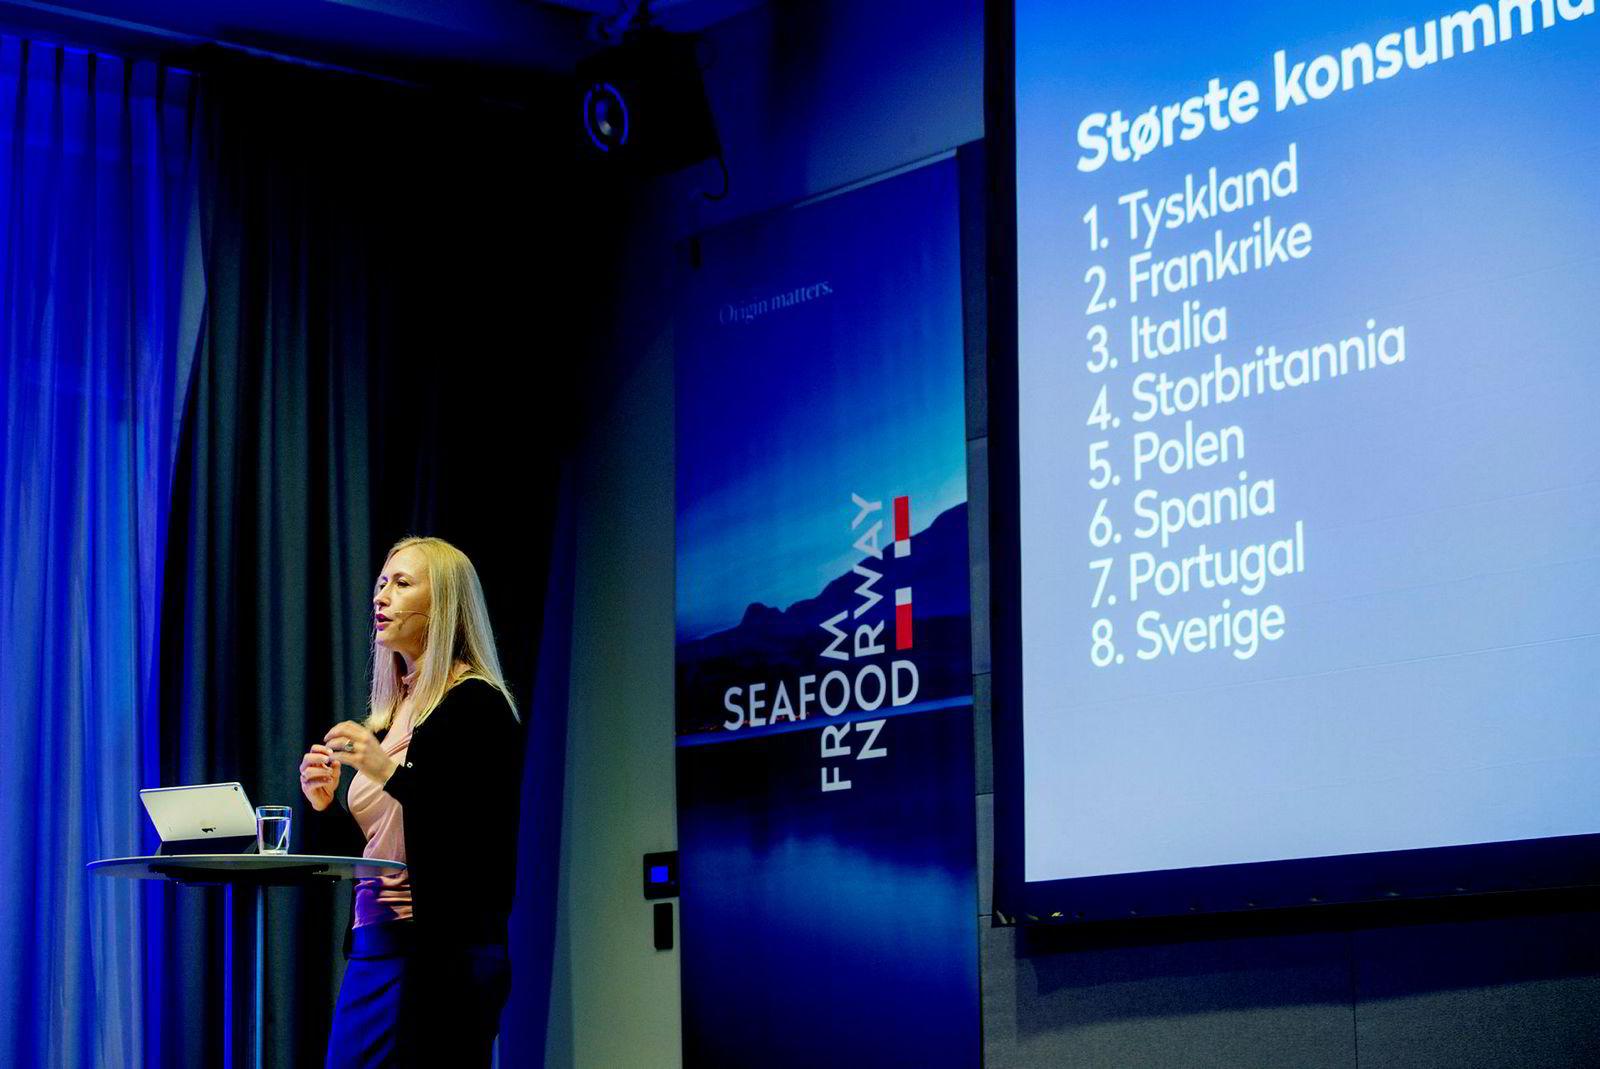 Administrerende direktør i Renate Larsen presenterte mandag Norges Sjømatråds årstall for 2017.